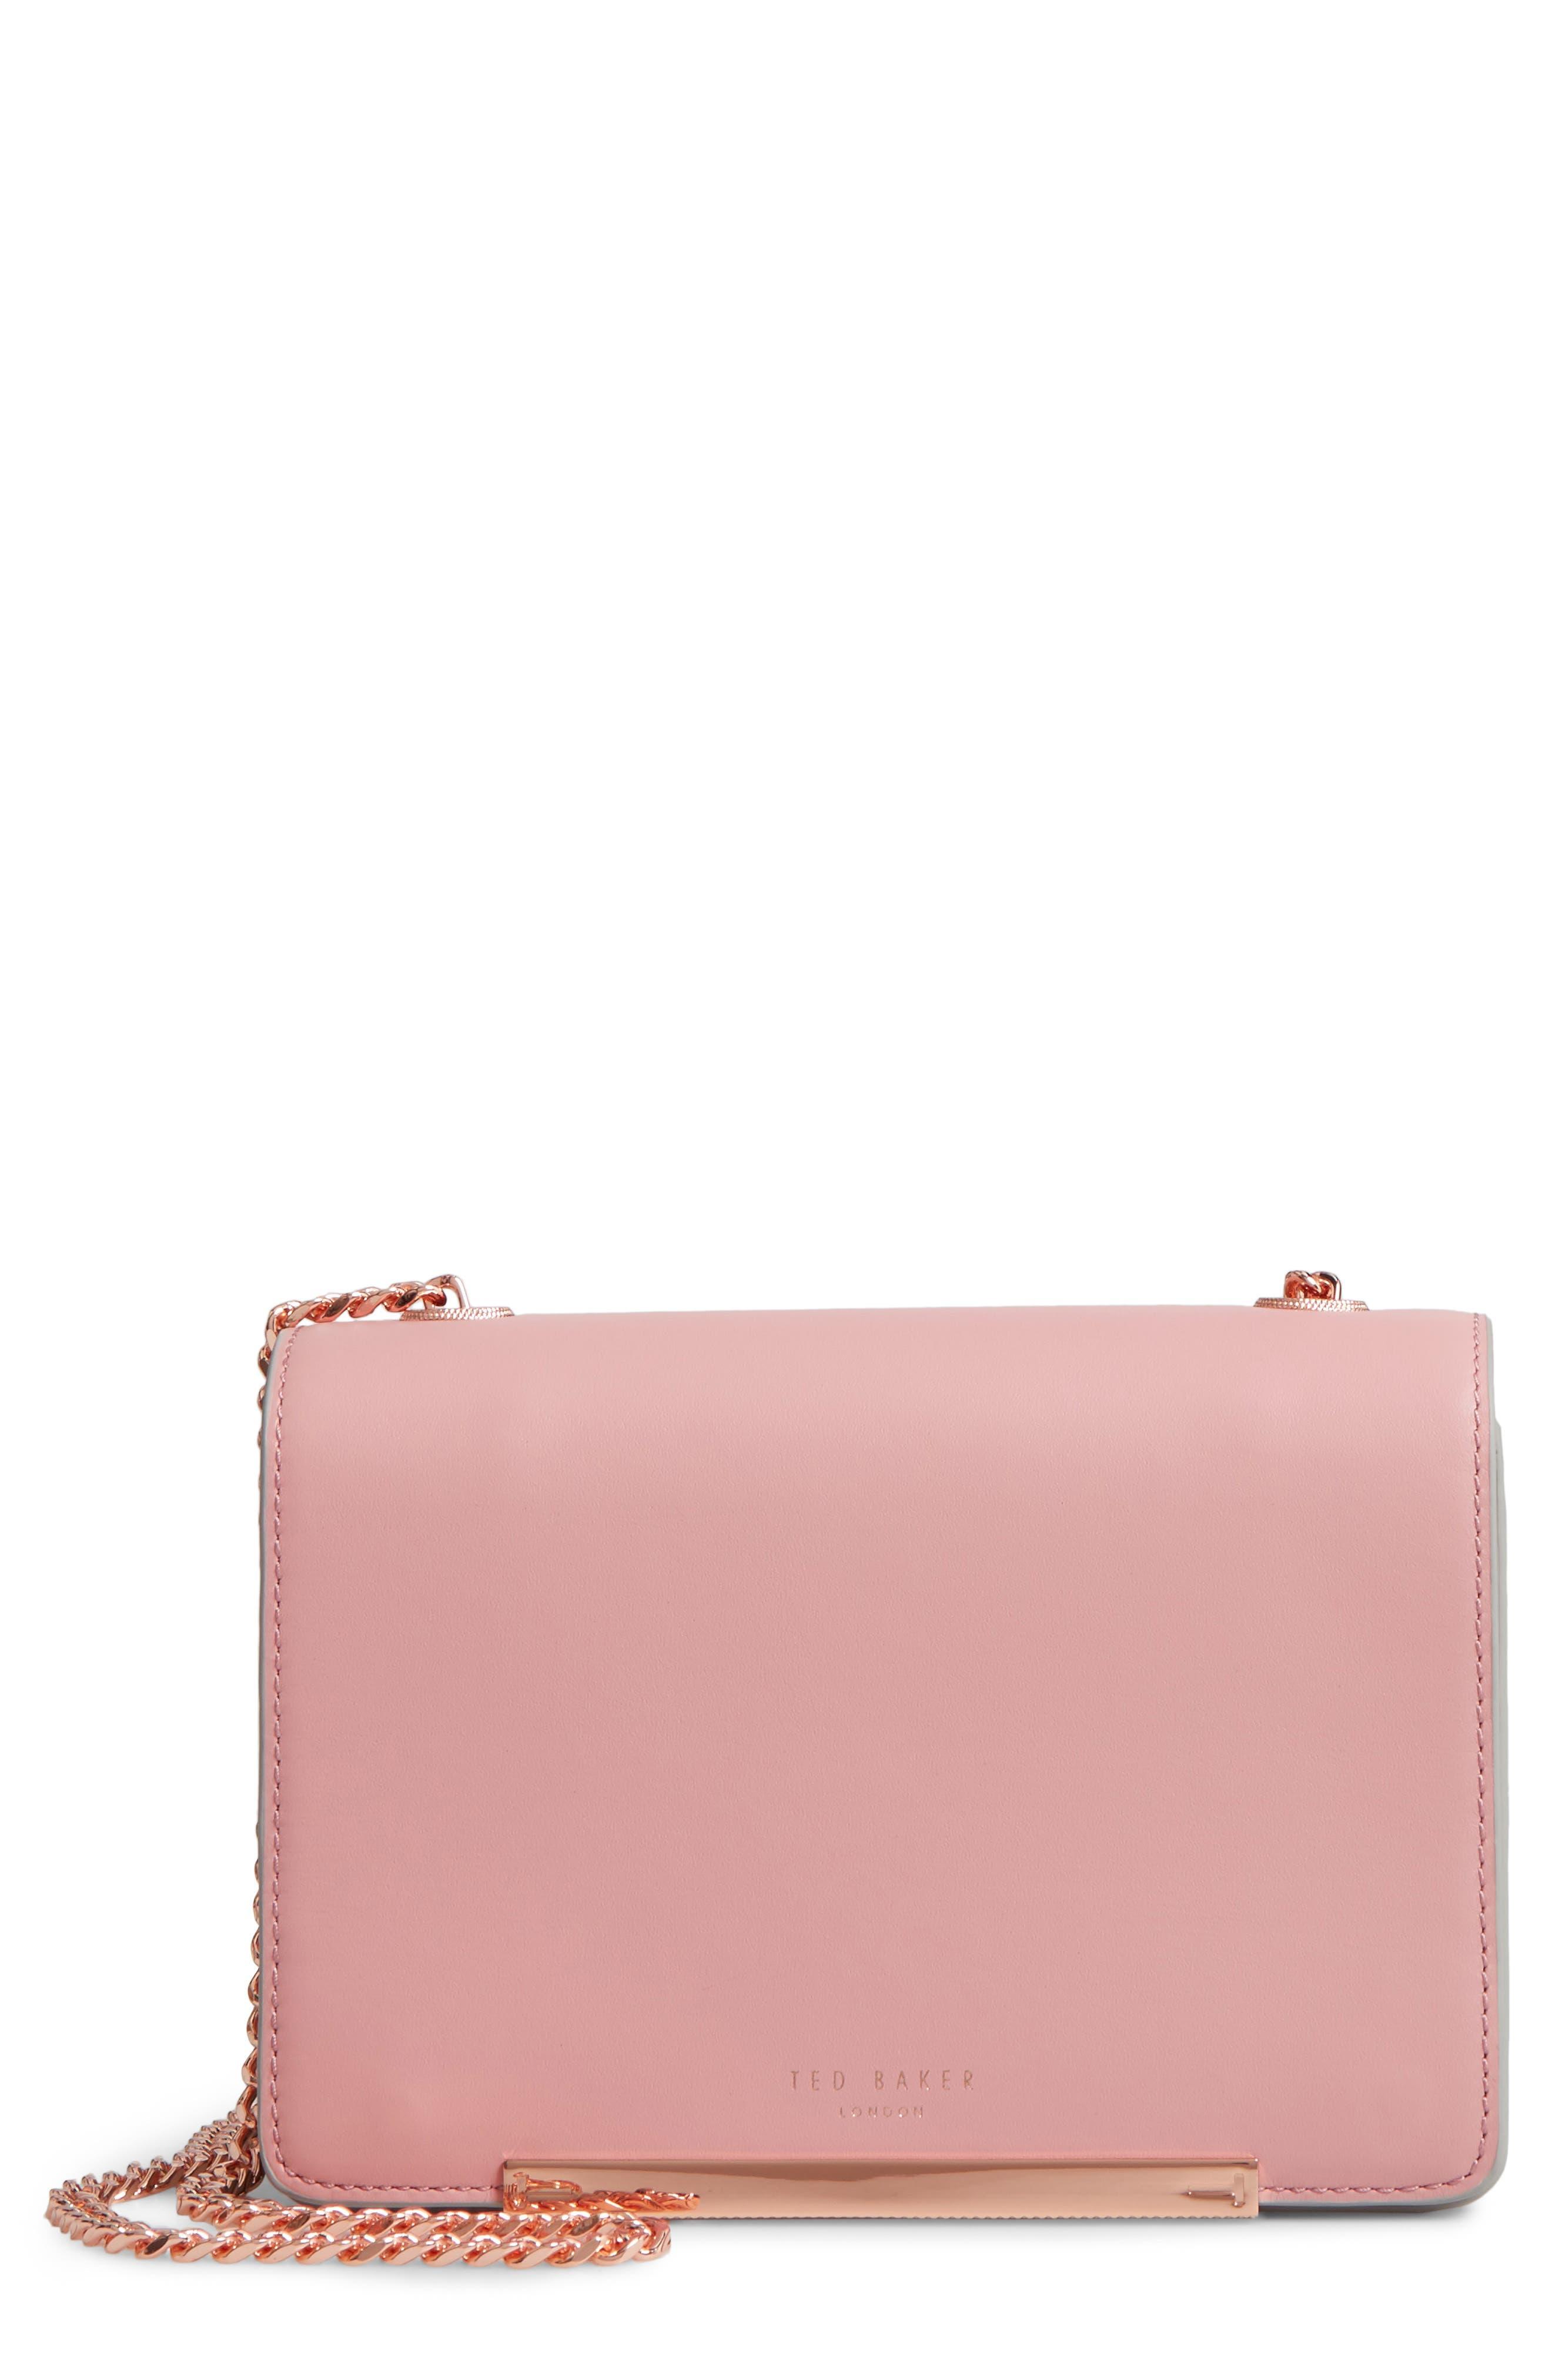 Earie Leather Crossbody Bag,                             Main thumbnail 1, color,                             Dusky Pink